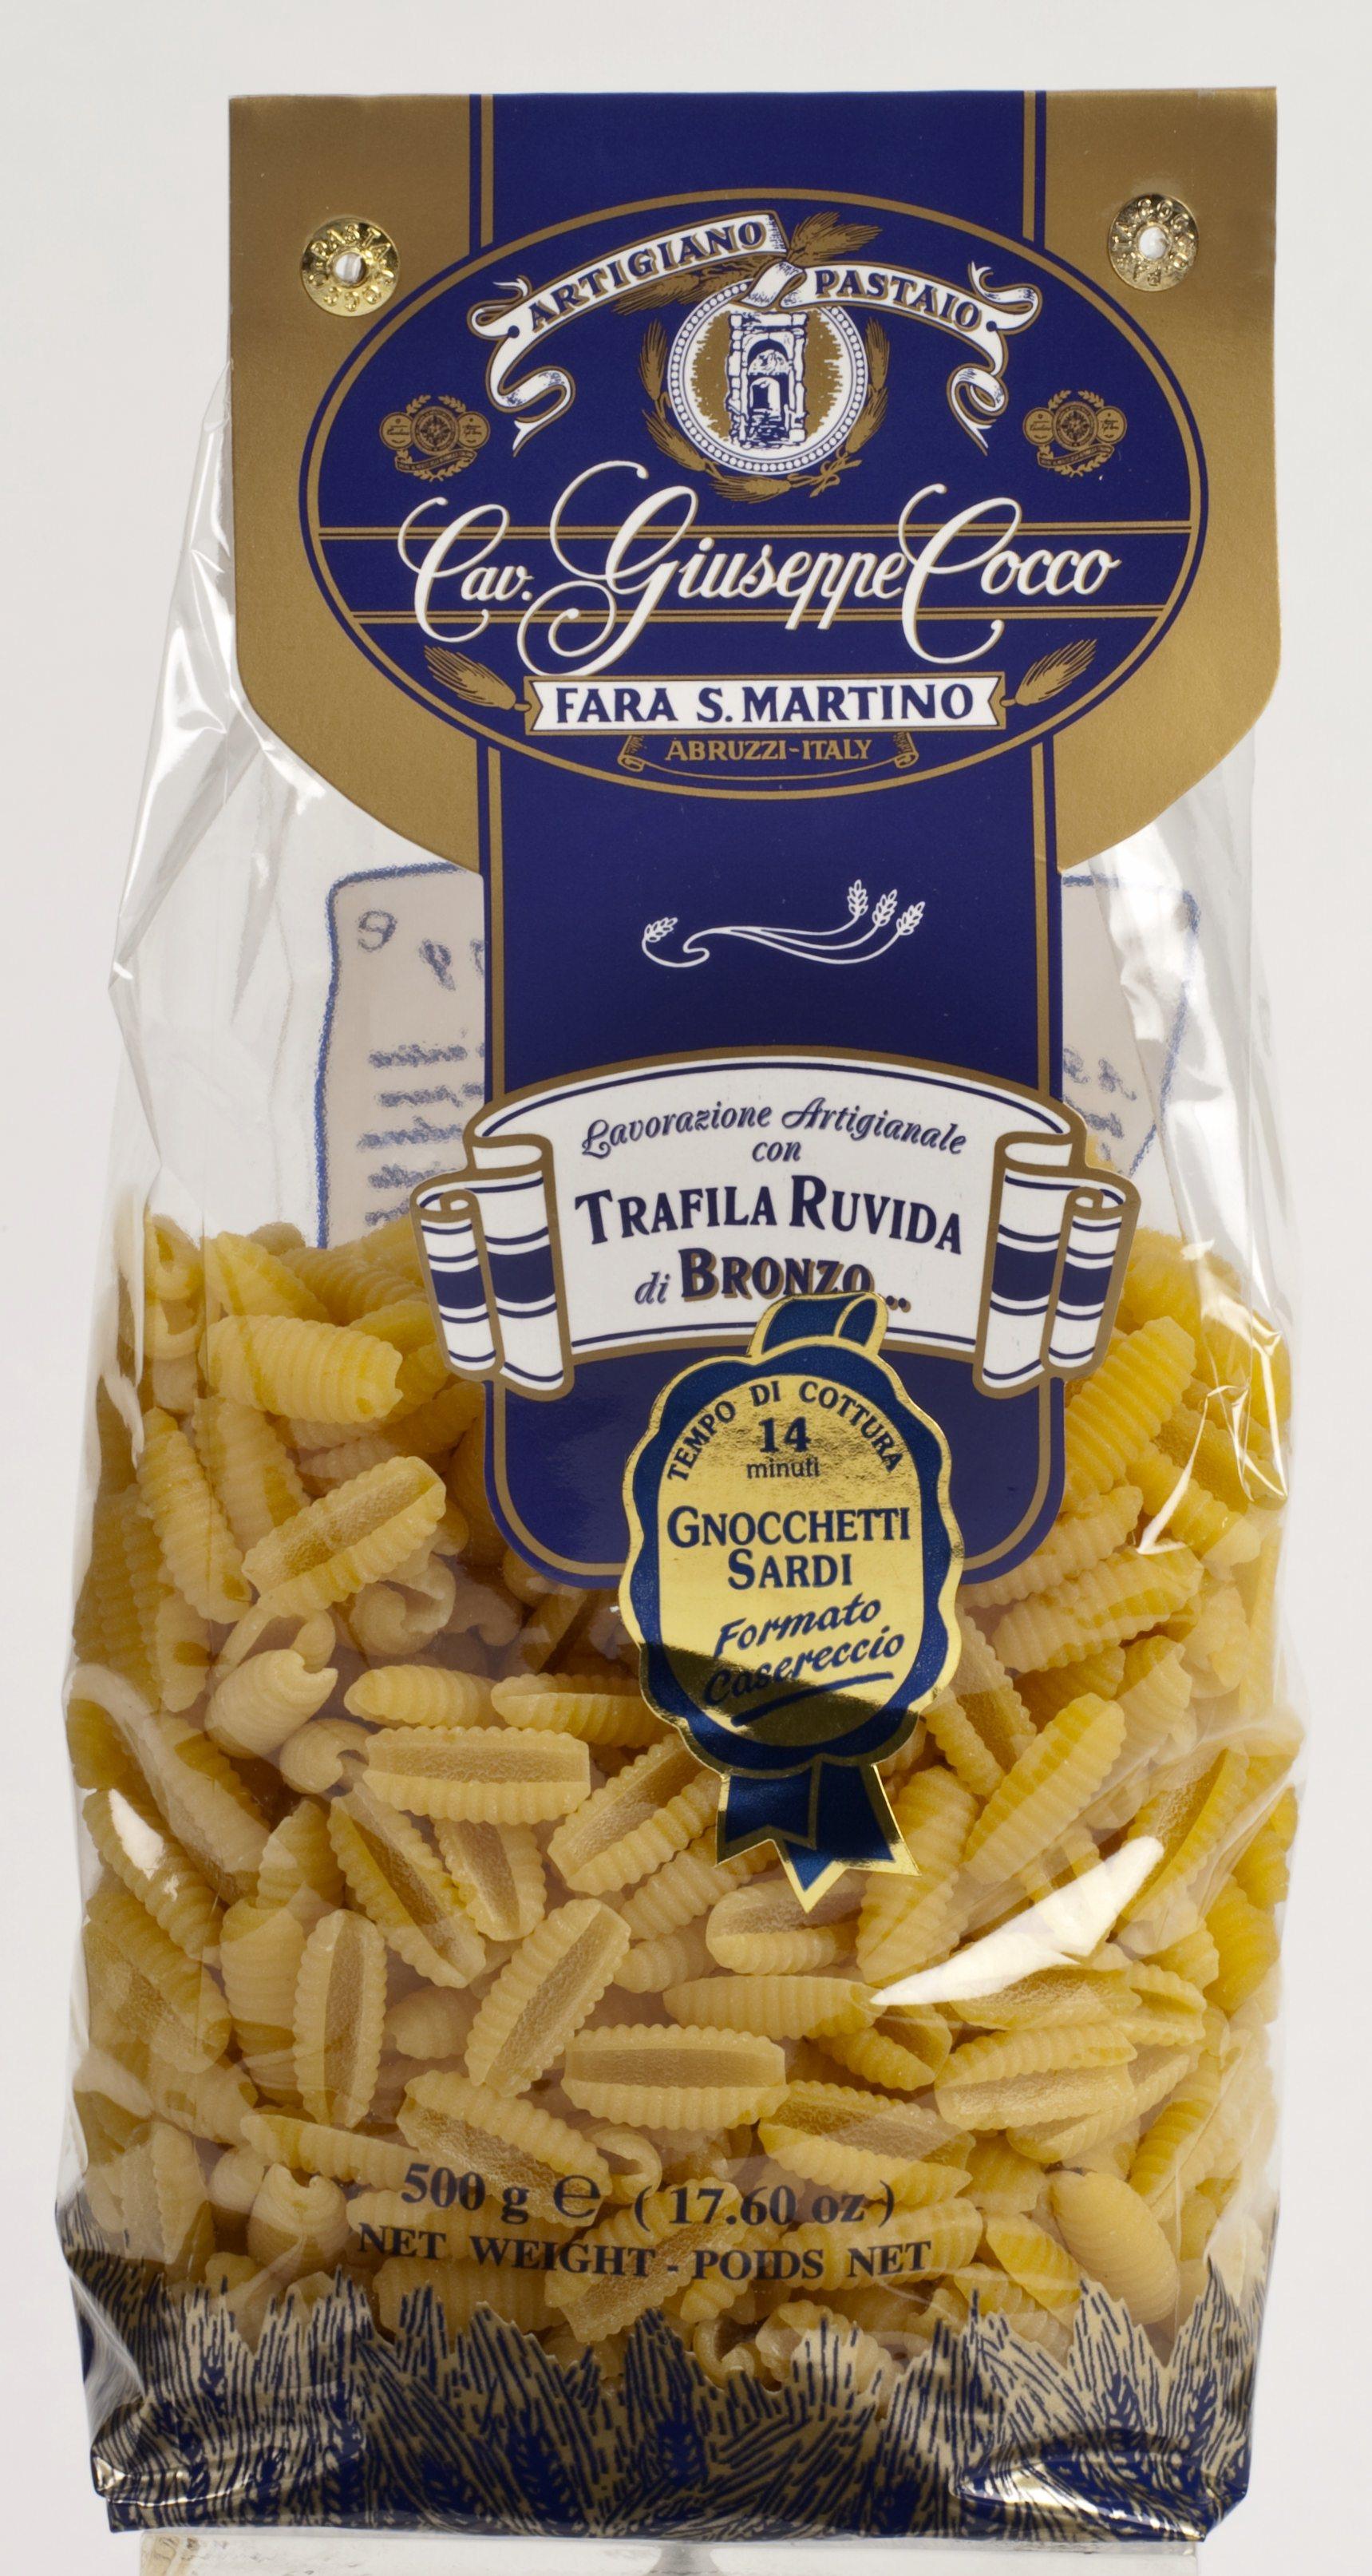 Gnocchetti Sardi Nr. 60 500 g Packung Cocco